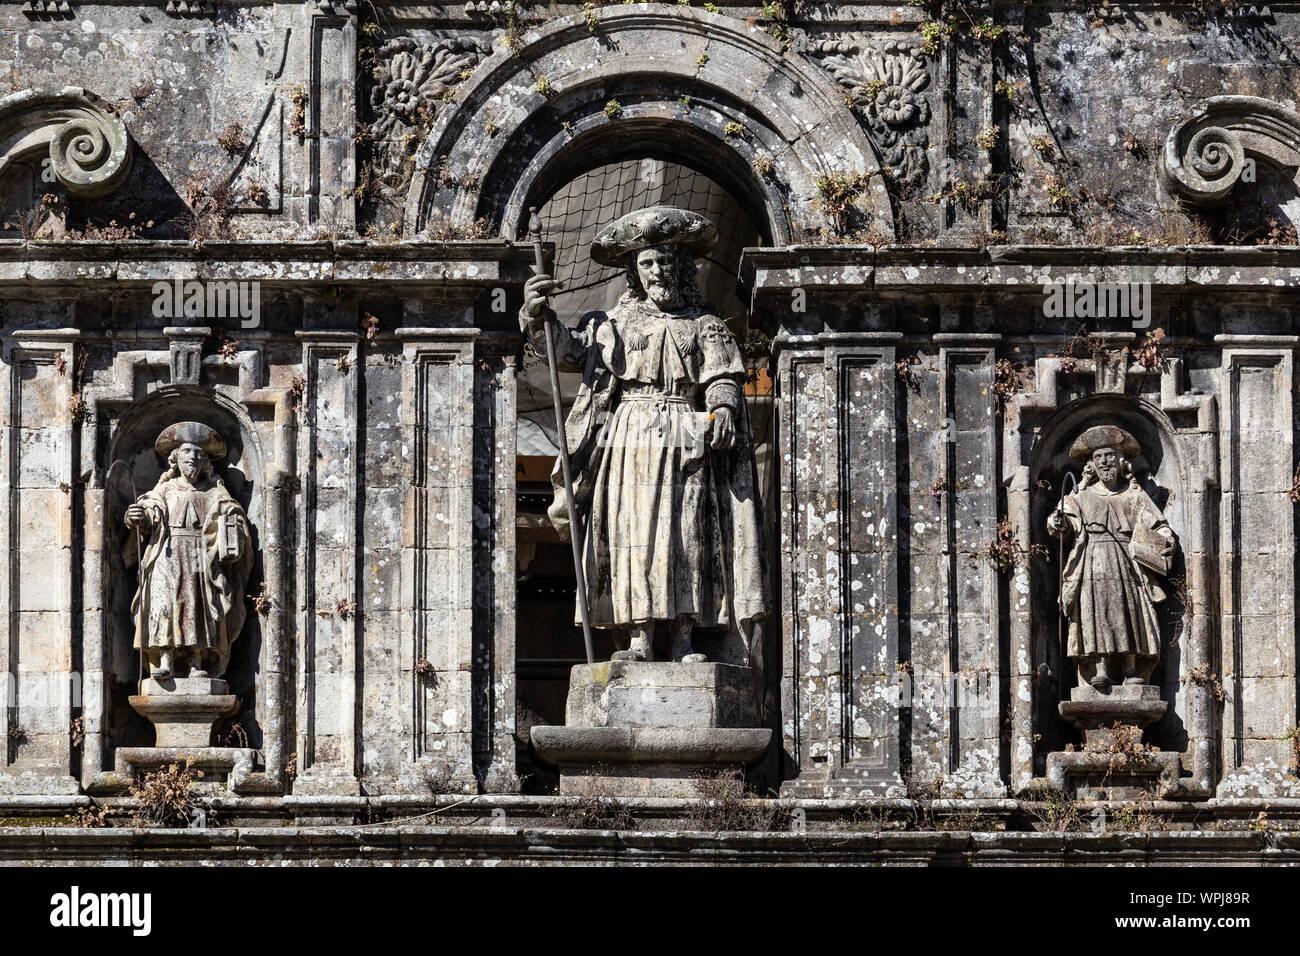 Sculpture of the Apostle Santiago and his disciples. East facade of Santiago de Compostela cathedral Stock Photo